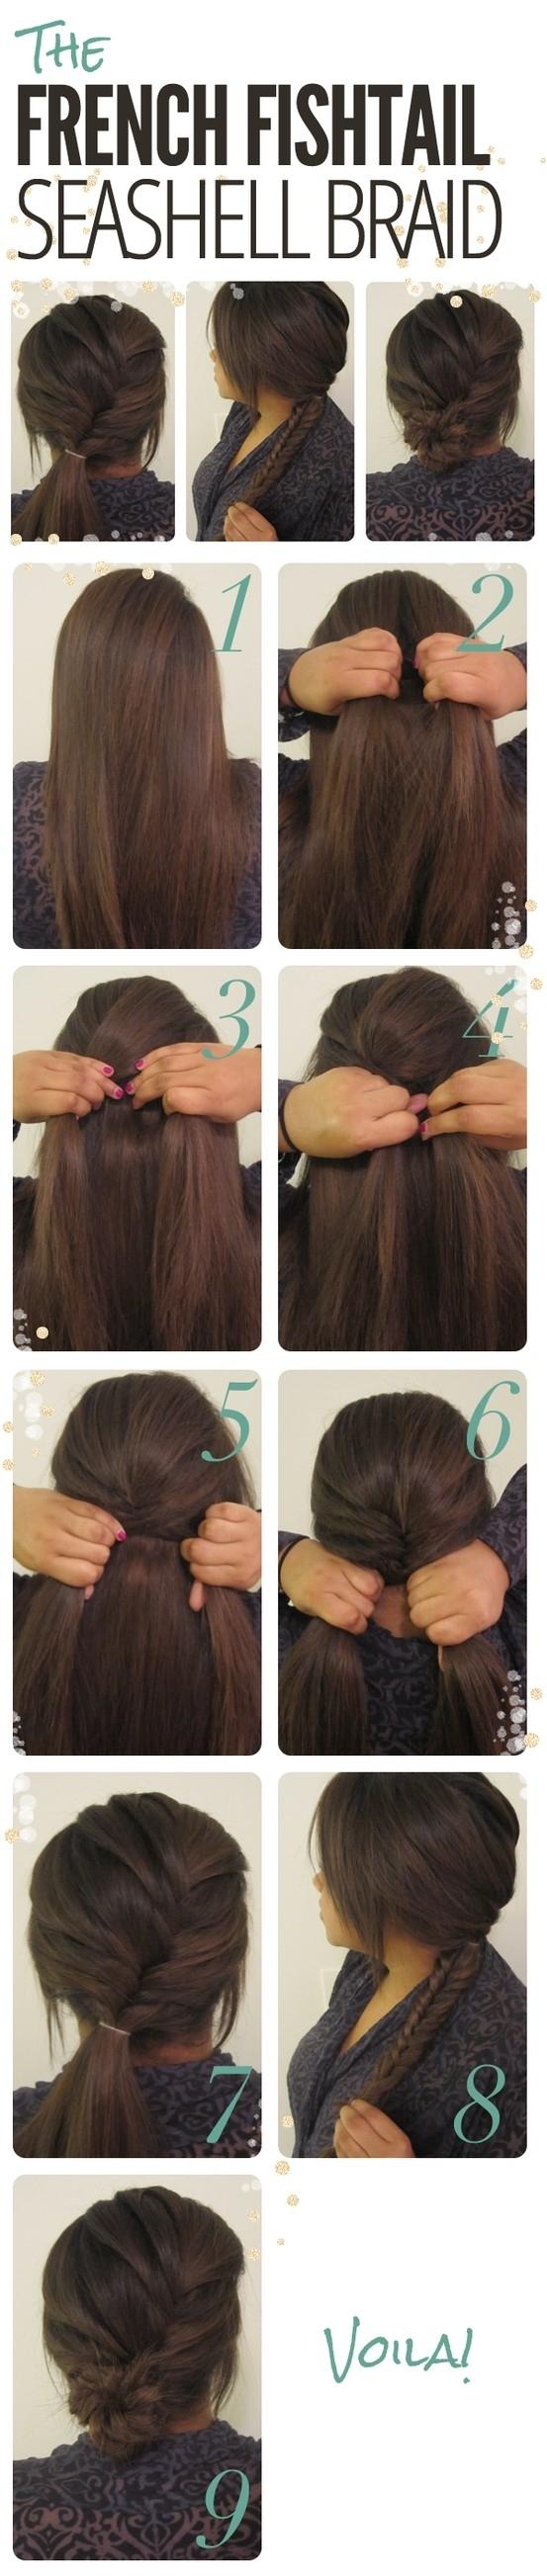 DIY French Fishtail Braid Hairstyle via